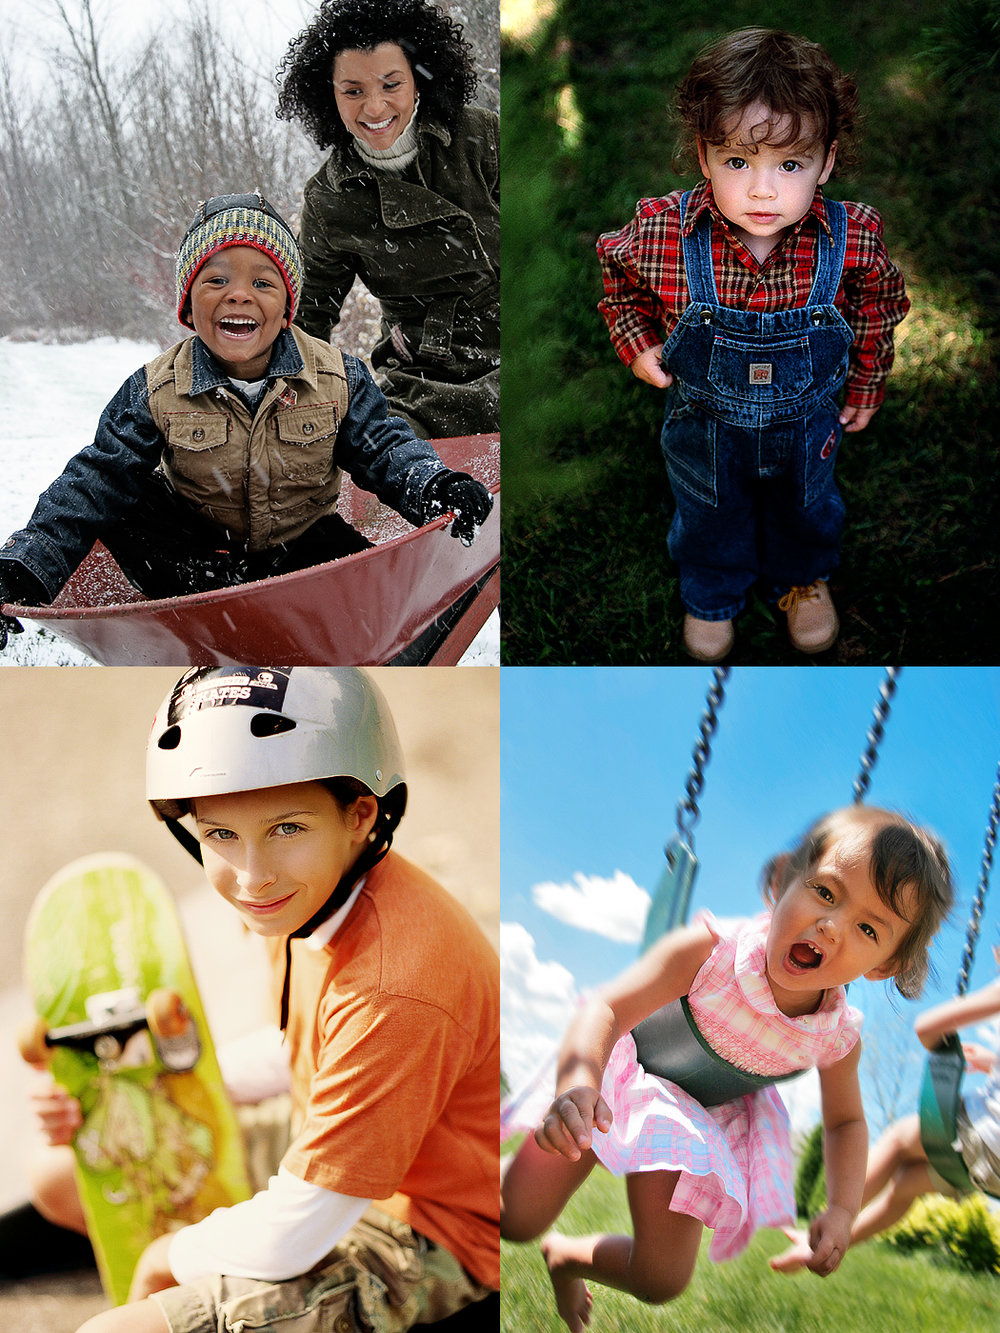 jun-pino-photography-child-models.jpg